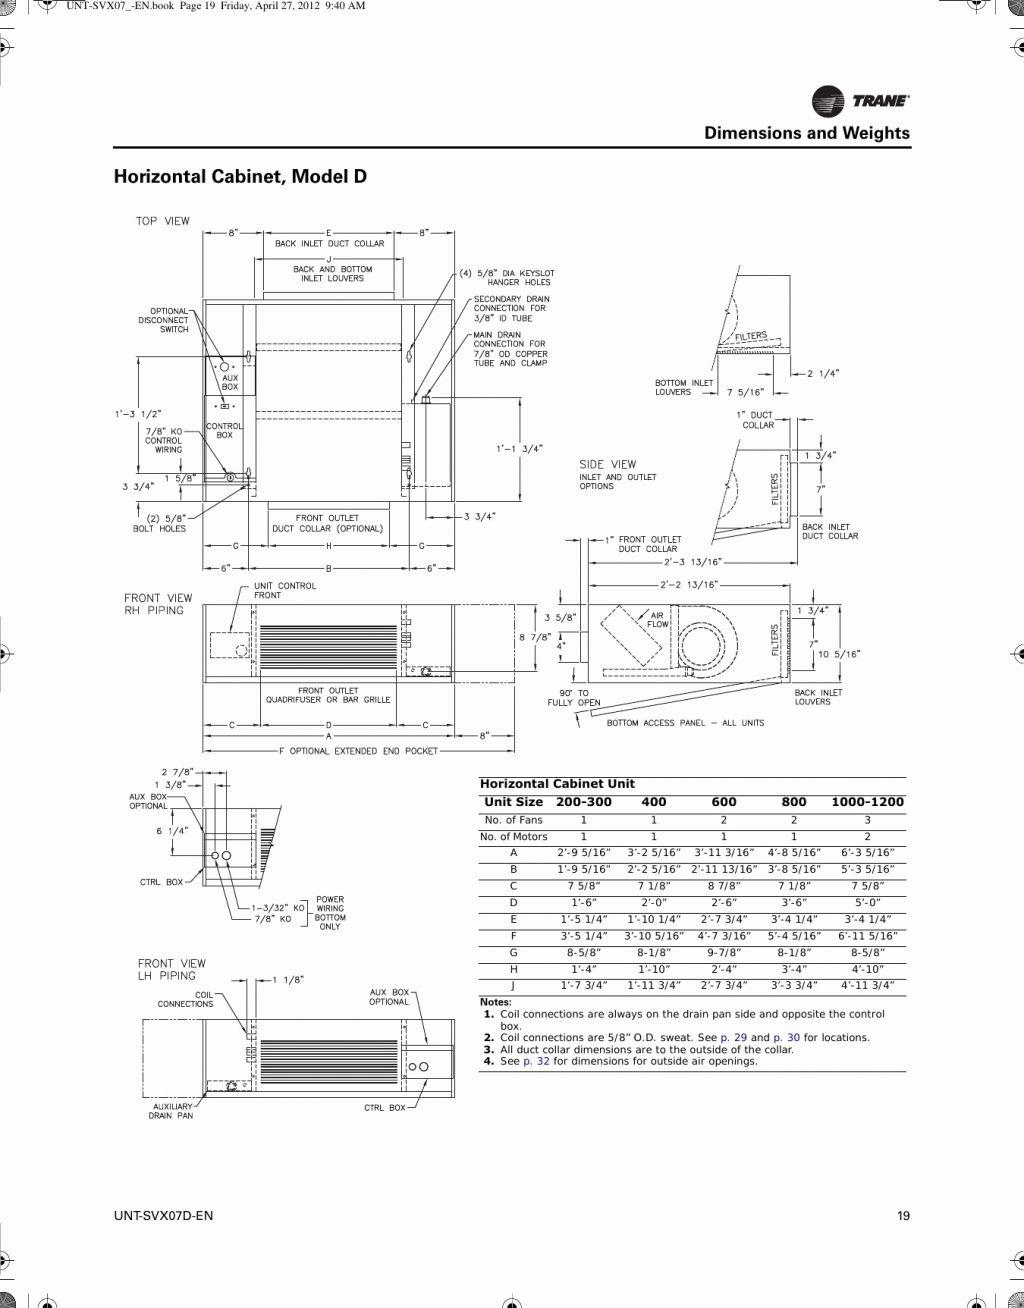 hight resolution of honda xl80 wiring diagram simple wiring schema 1994 honda accord wiring diagram 86 honda xr80 wiring diagram